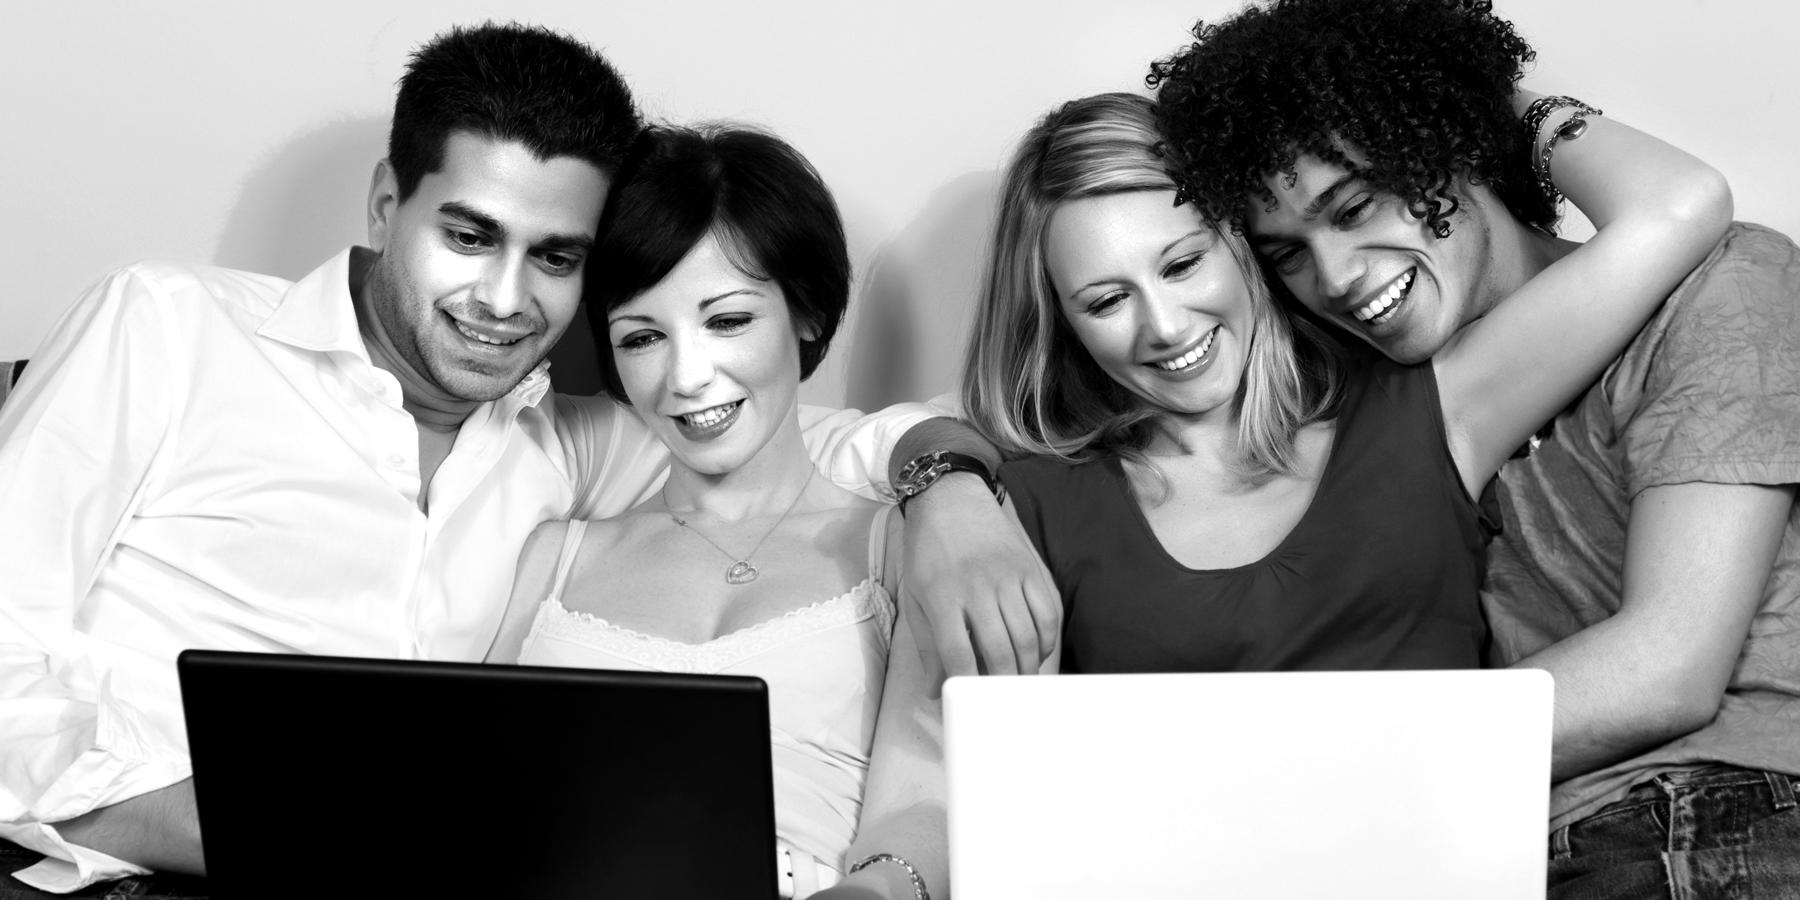 OnlineShop, eCommerce